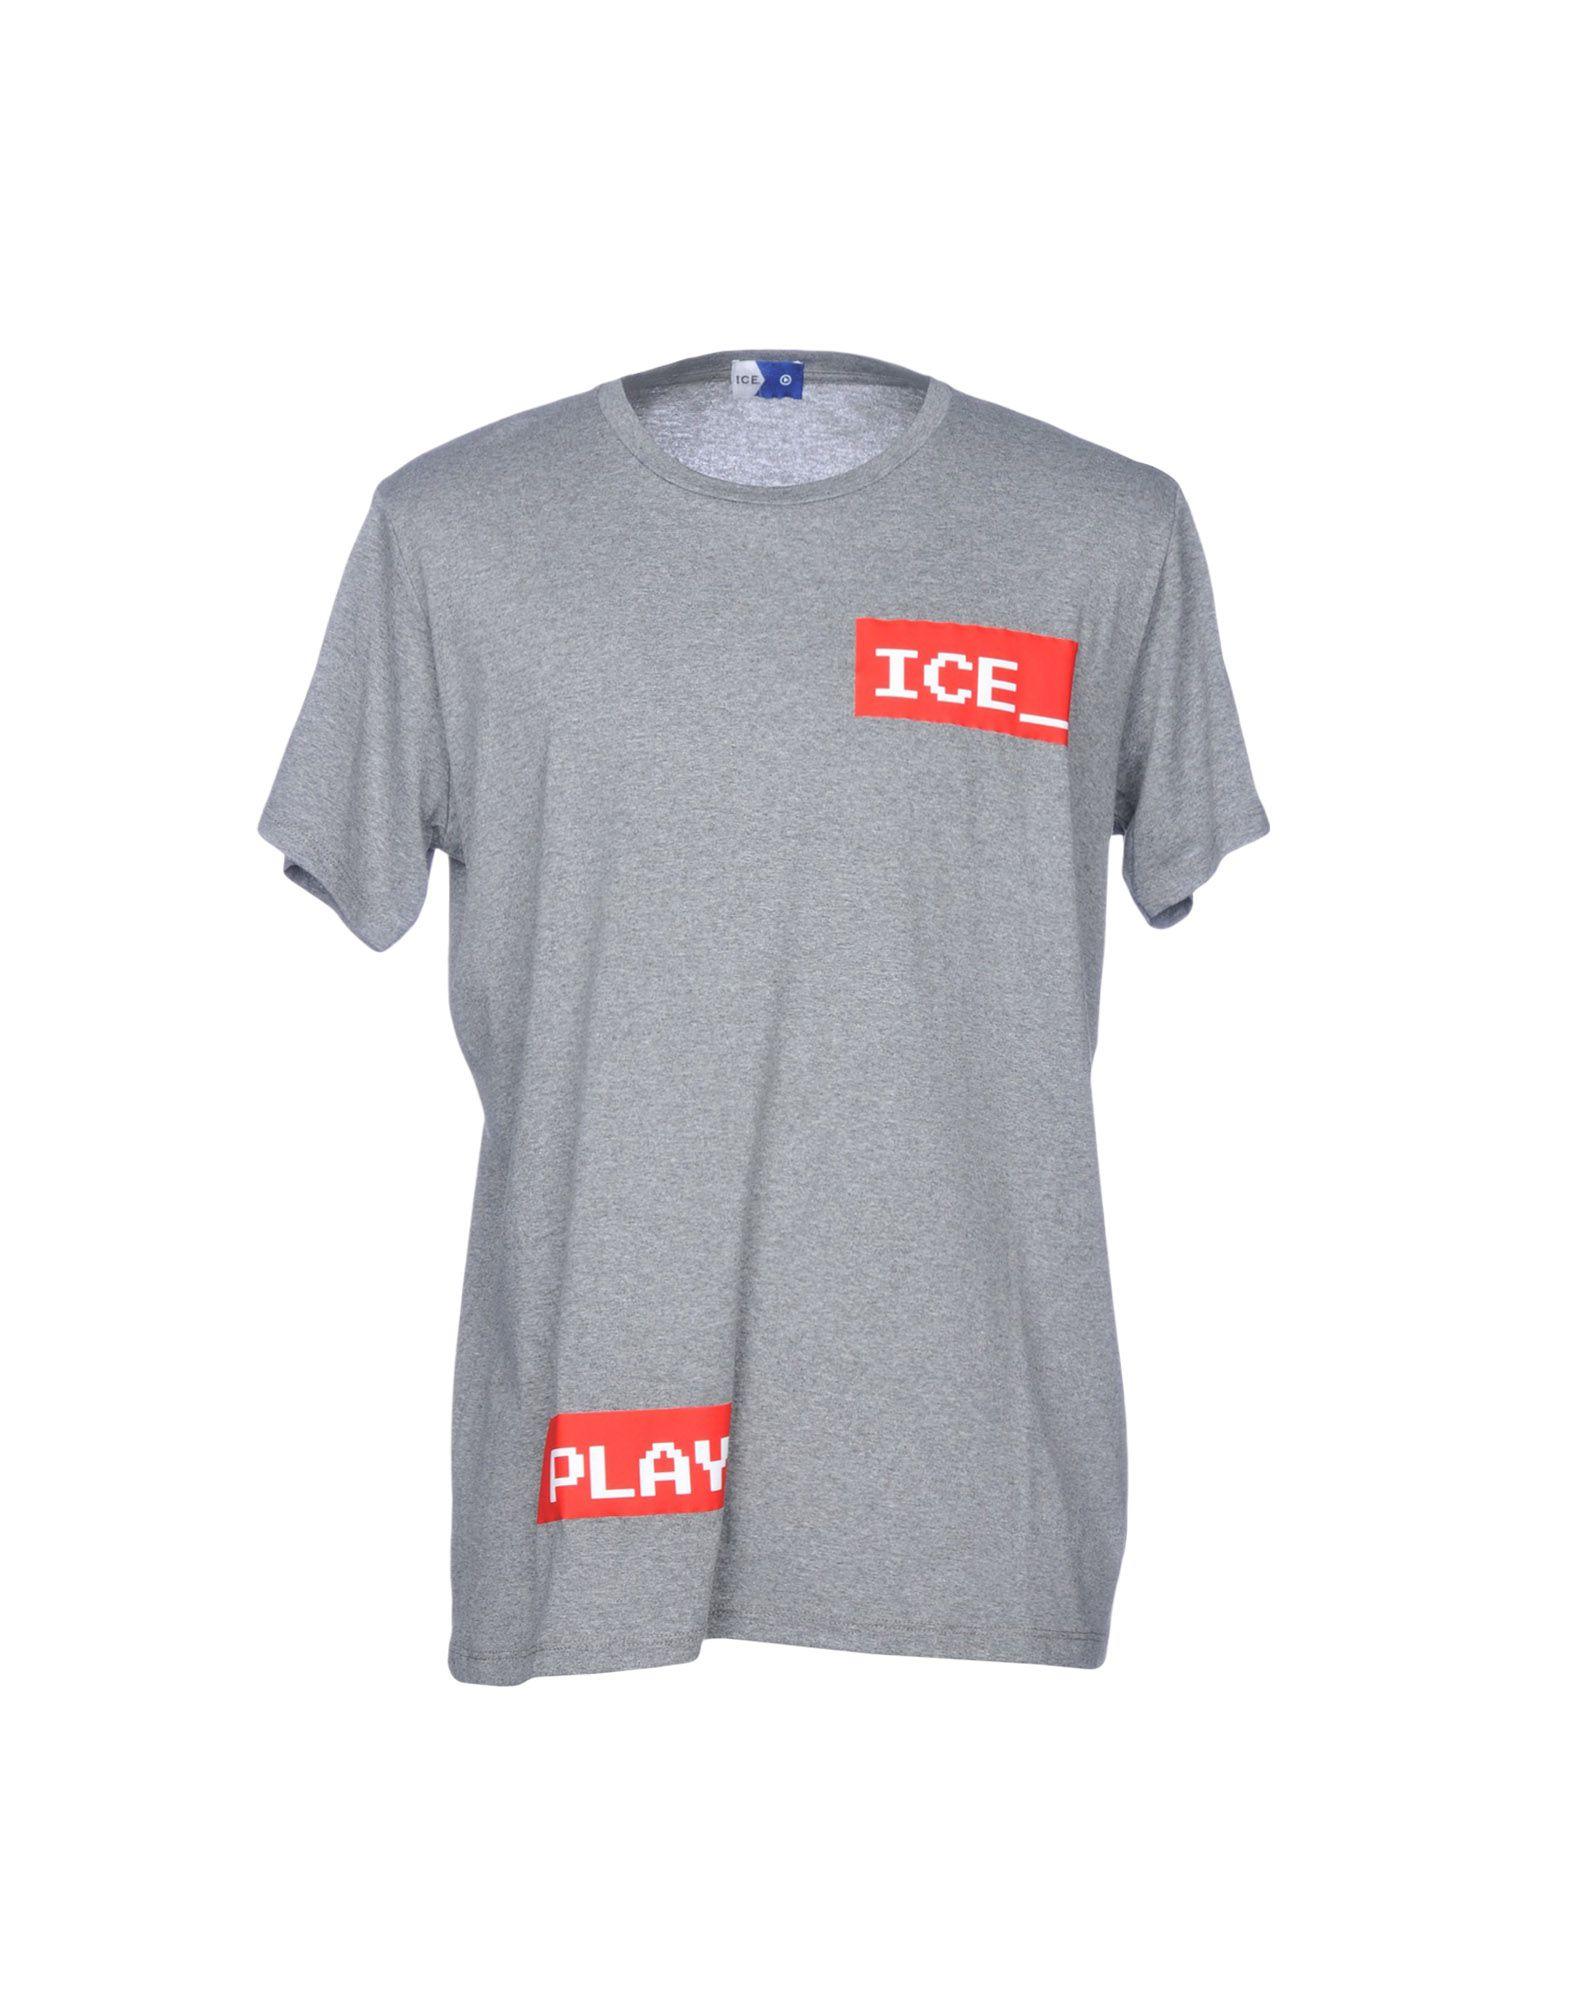 ICE PLAY Футболка